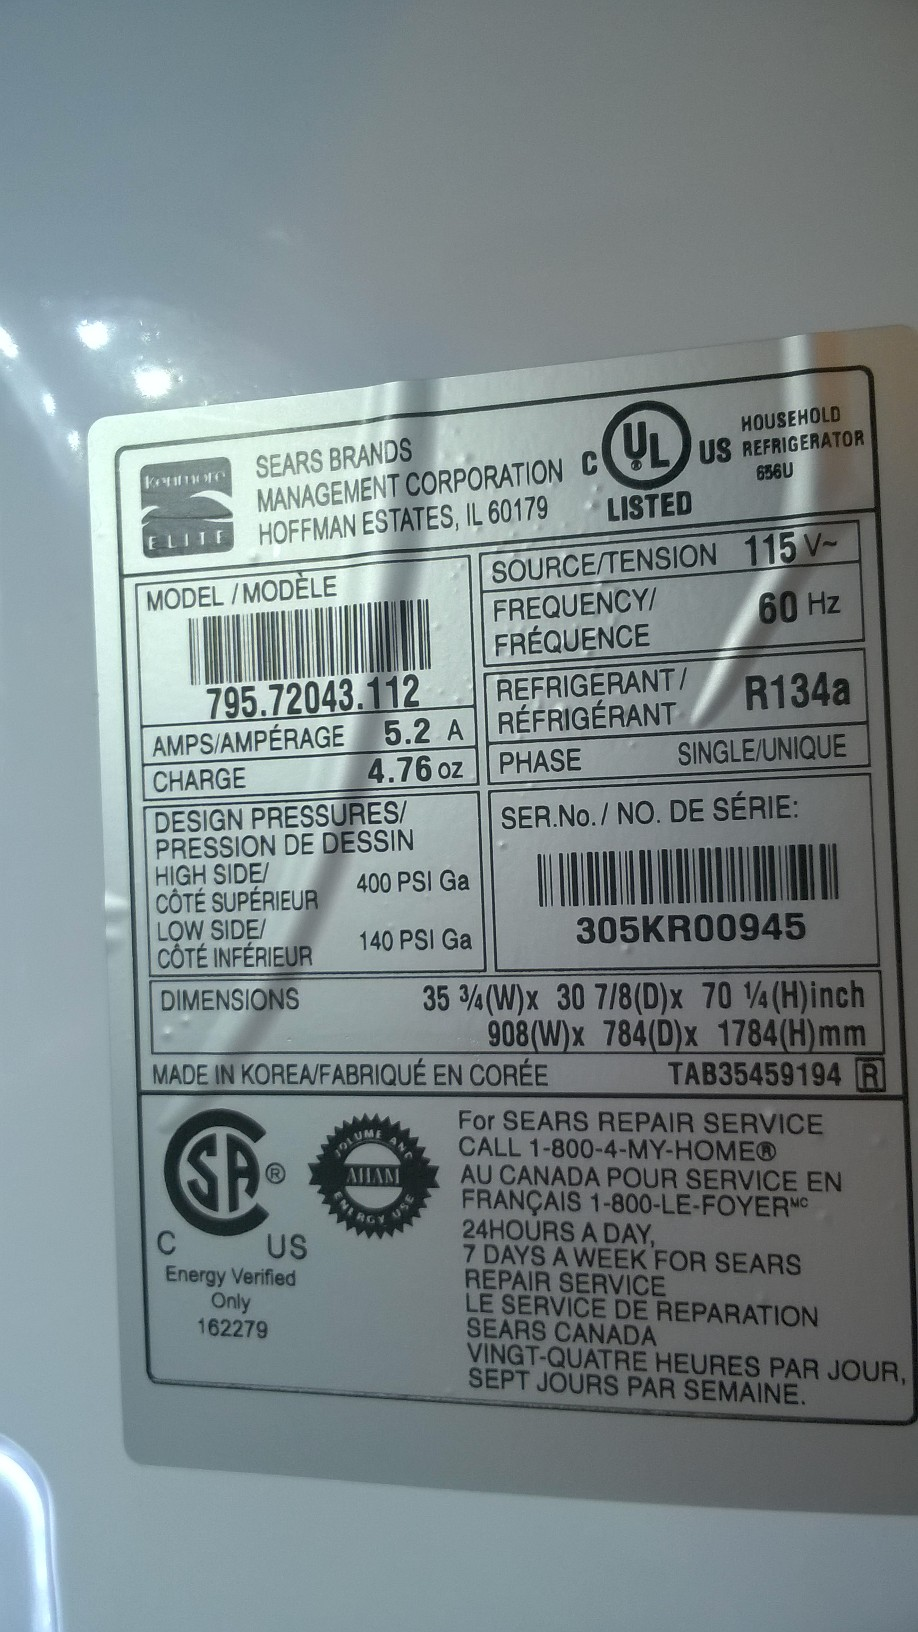 Sears Canada Appliance Repair 79572043112 Kenmore Elite French Door Detecting A Leak In Front